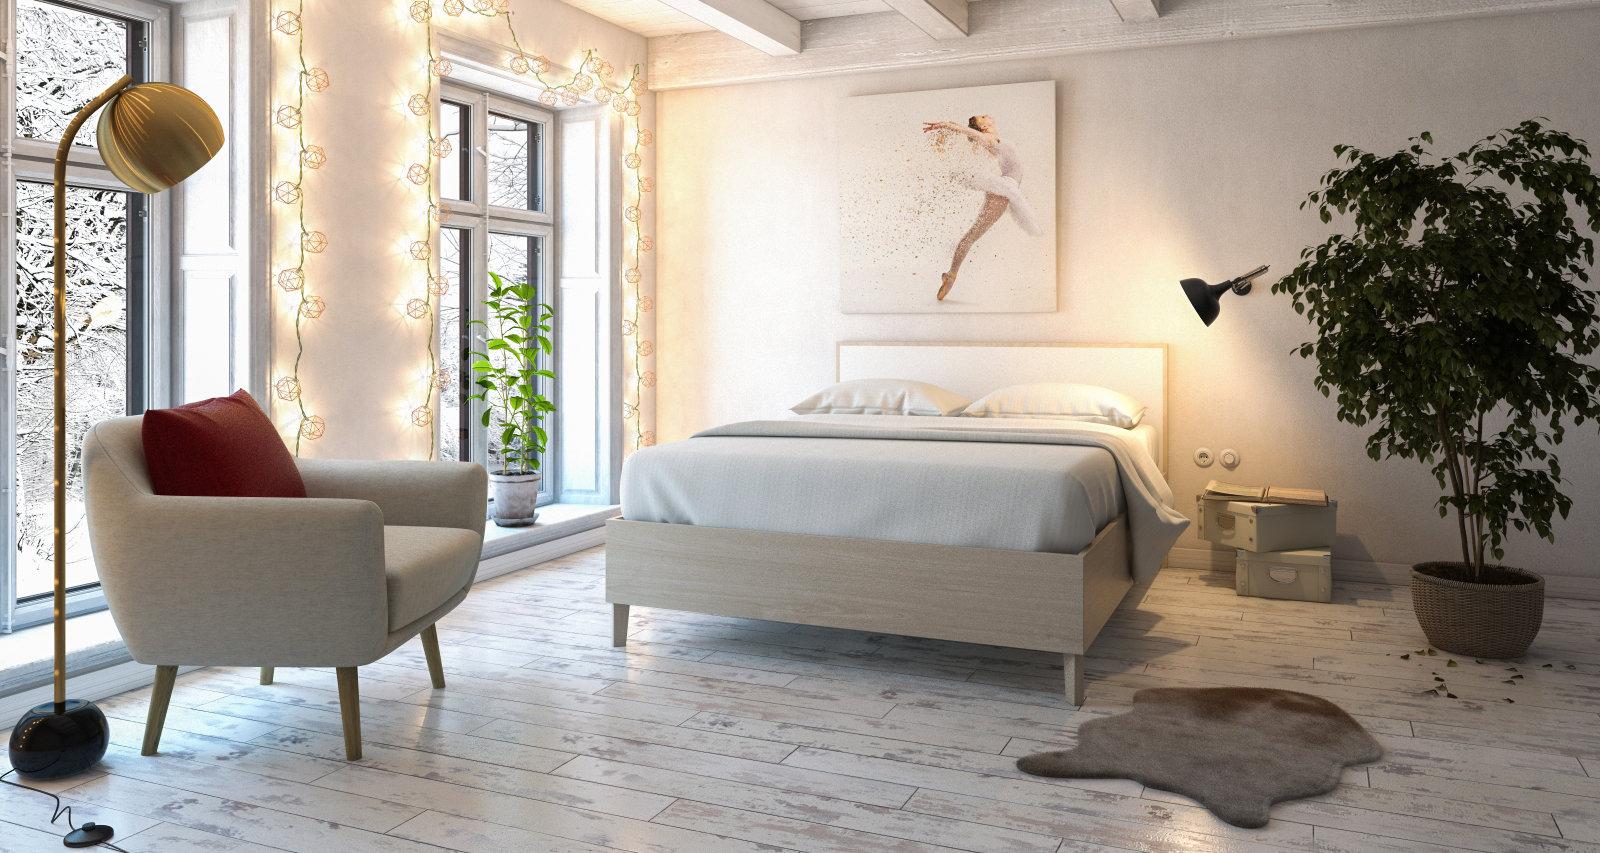 Chambre scandinave contemporaine beige blanche: inspiration style ...